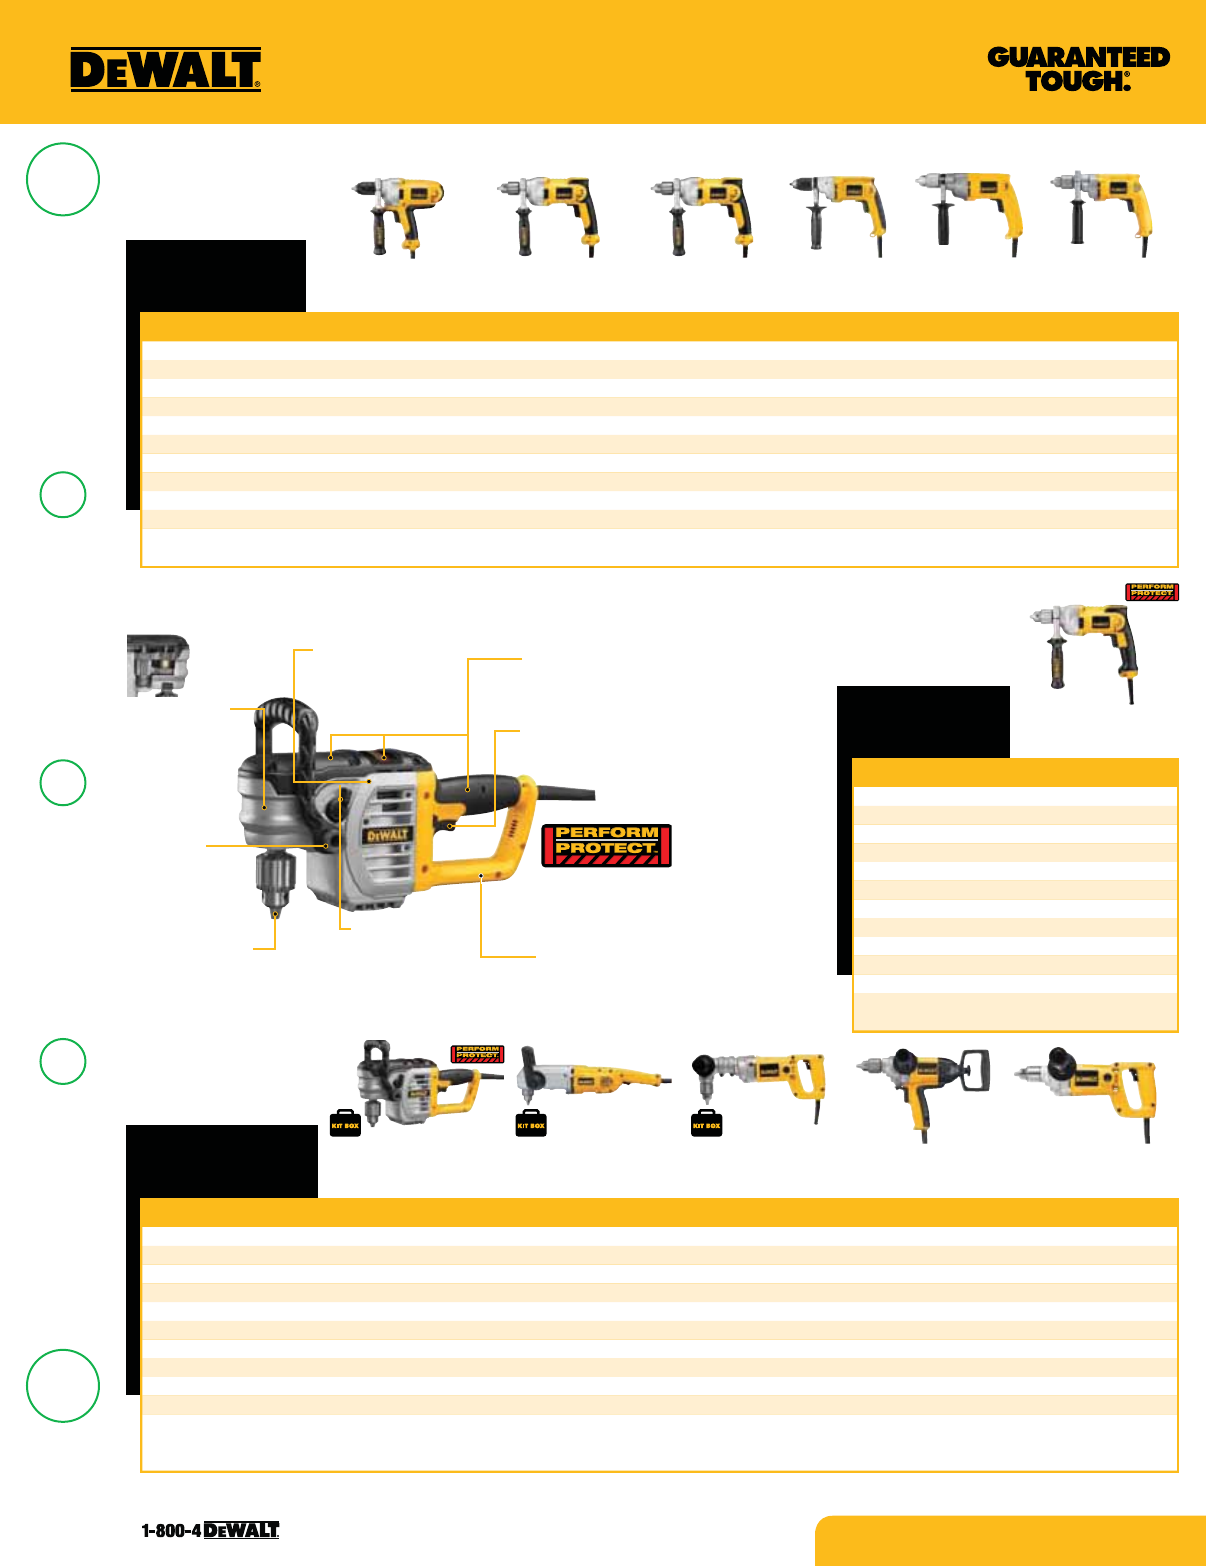 [SCHEMATICS_4FD]  9558B Dw268 De Walt Wiring Diagrams | Wiring Resources | Dw268 De Walt Wiring Diagrams |  | Wiring Resources